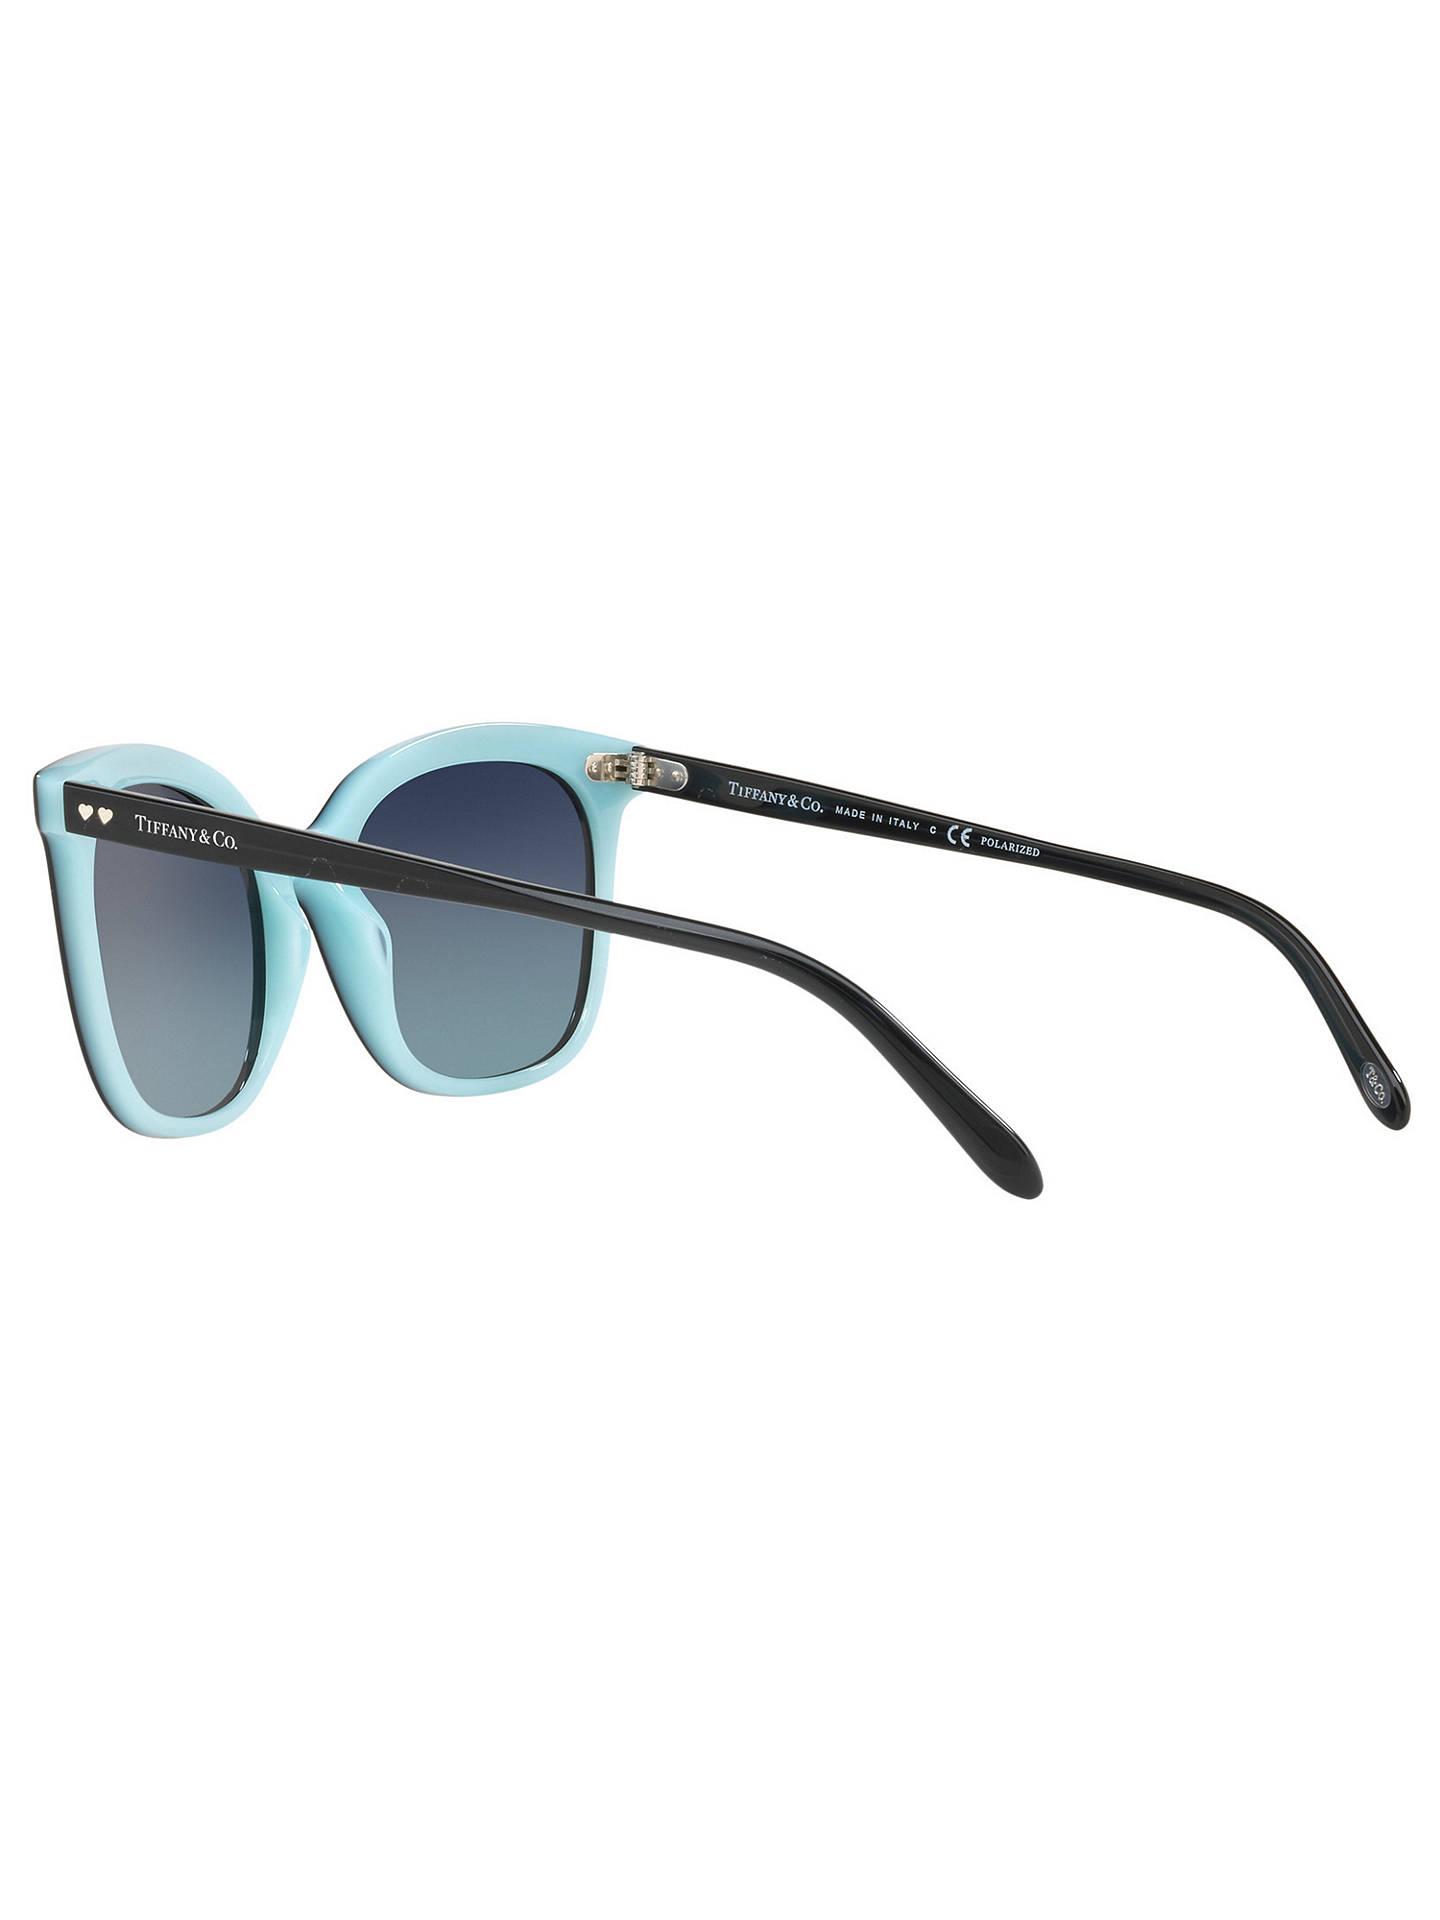 2aa40c87f9 ... Buy Tiffany   Co TF4140 Polarised Square Sunglasses